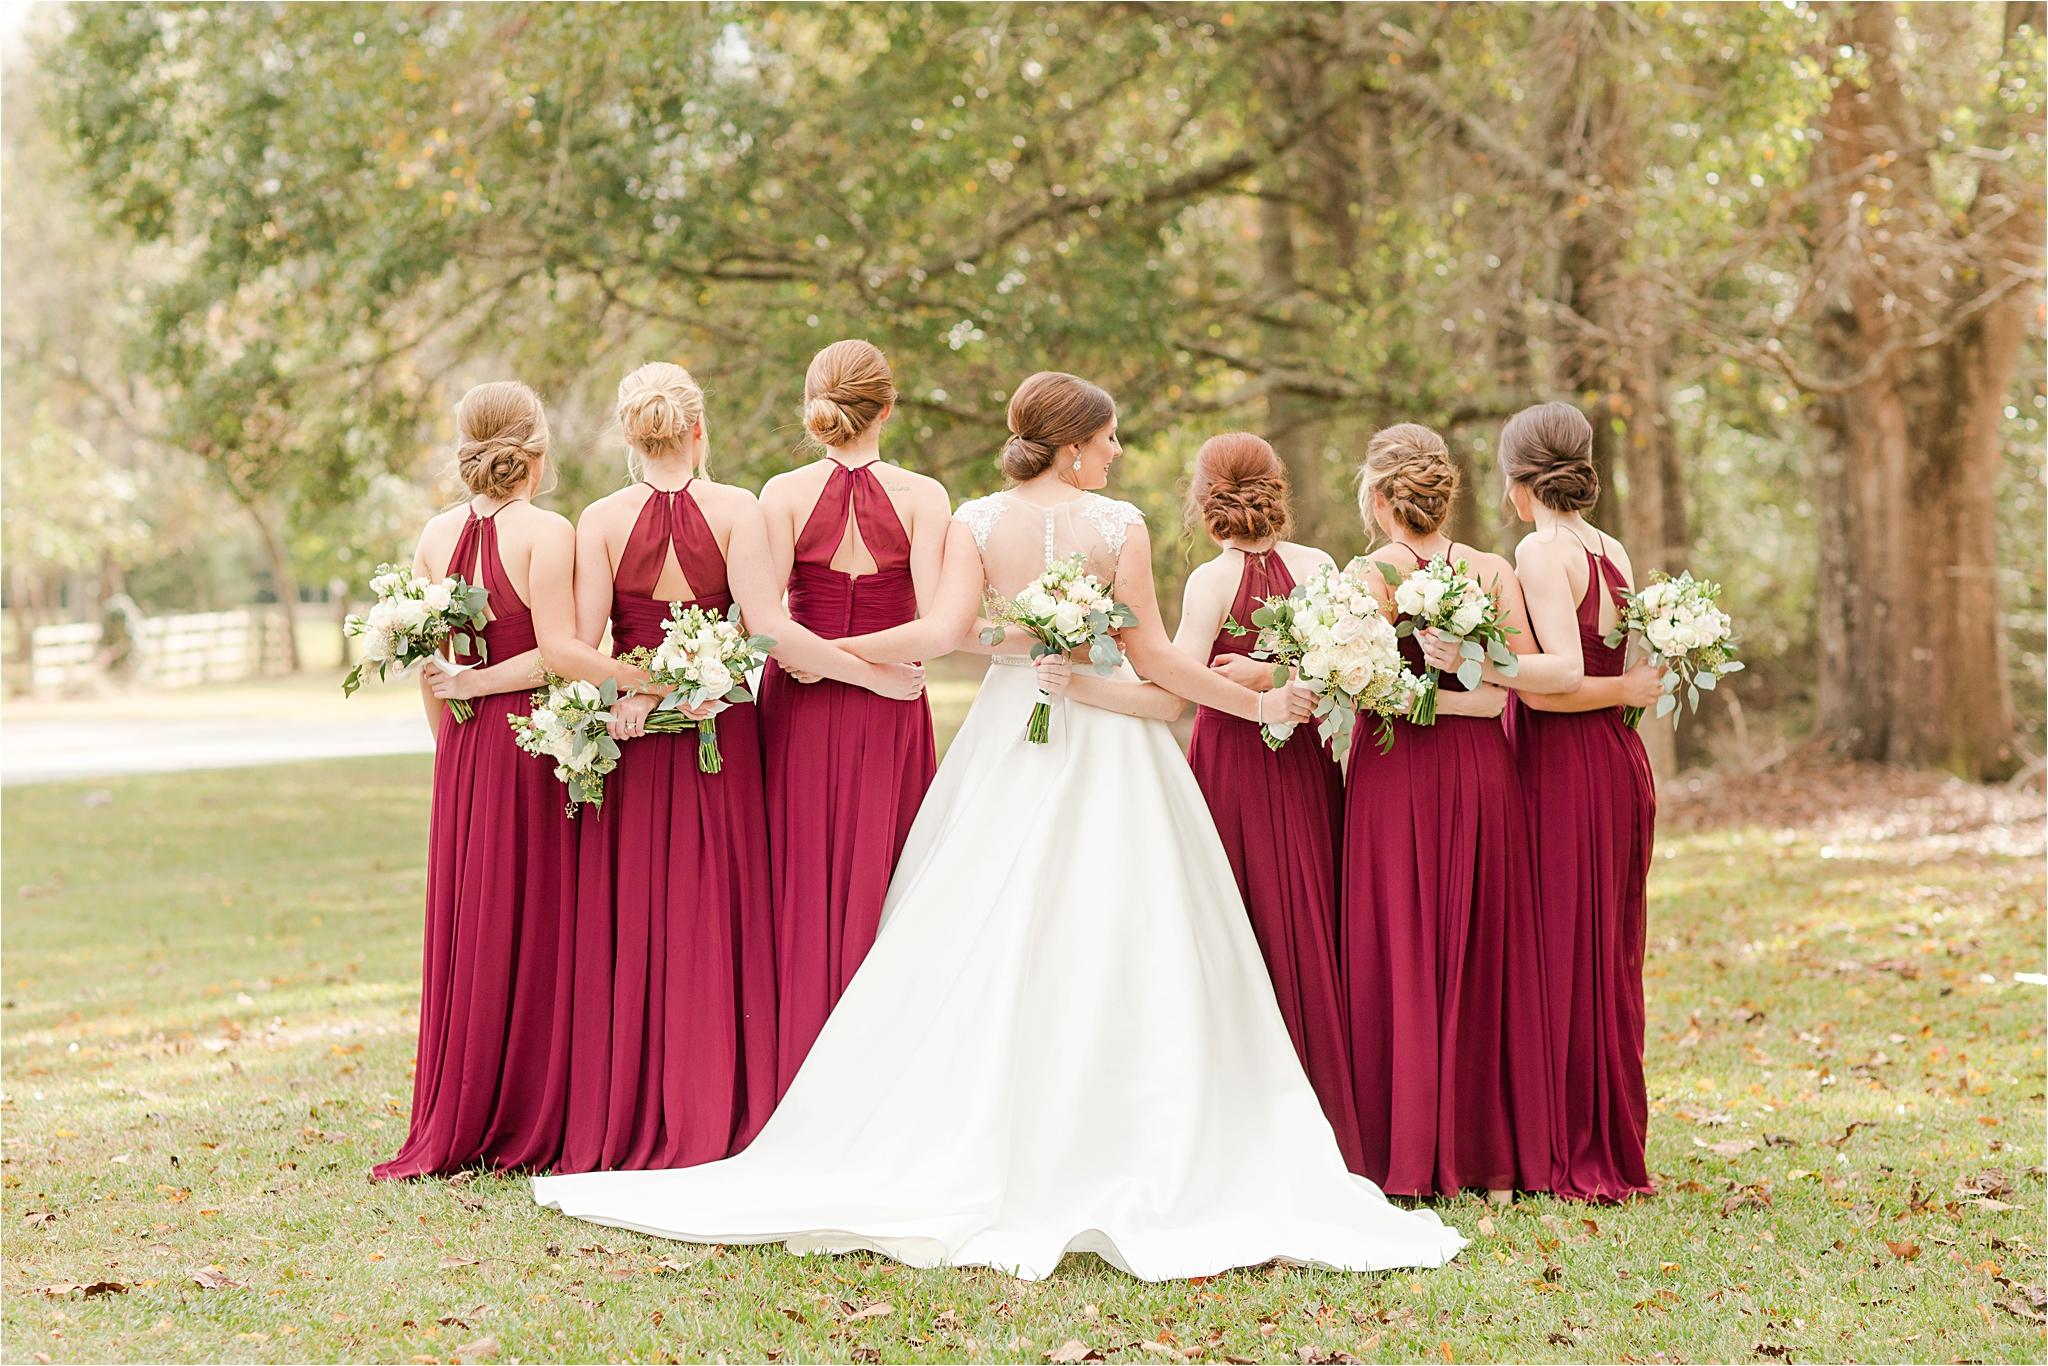 The Barn at Bridlewood Wedding in Hattiesburg, Mississippi